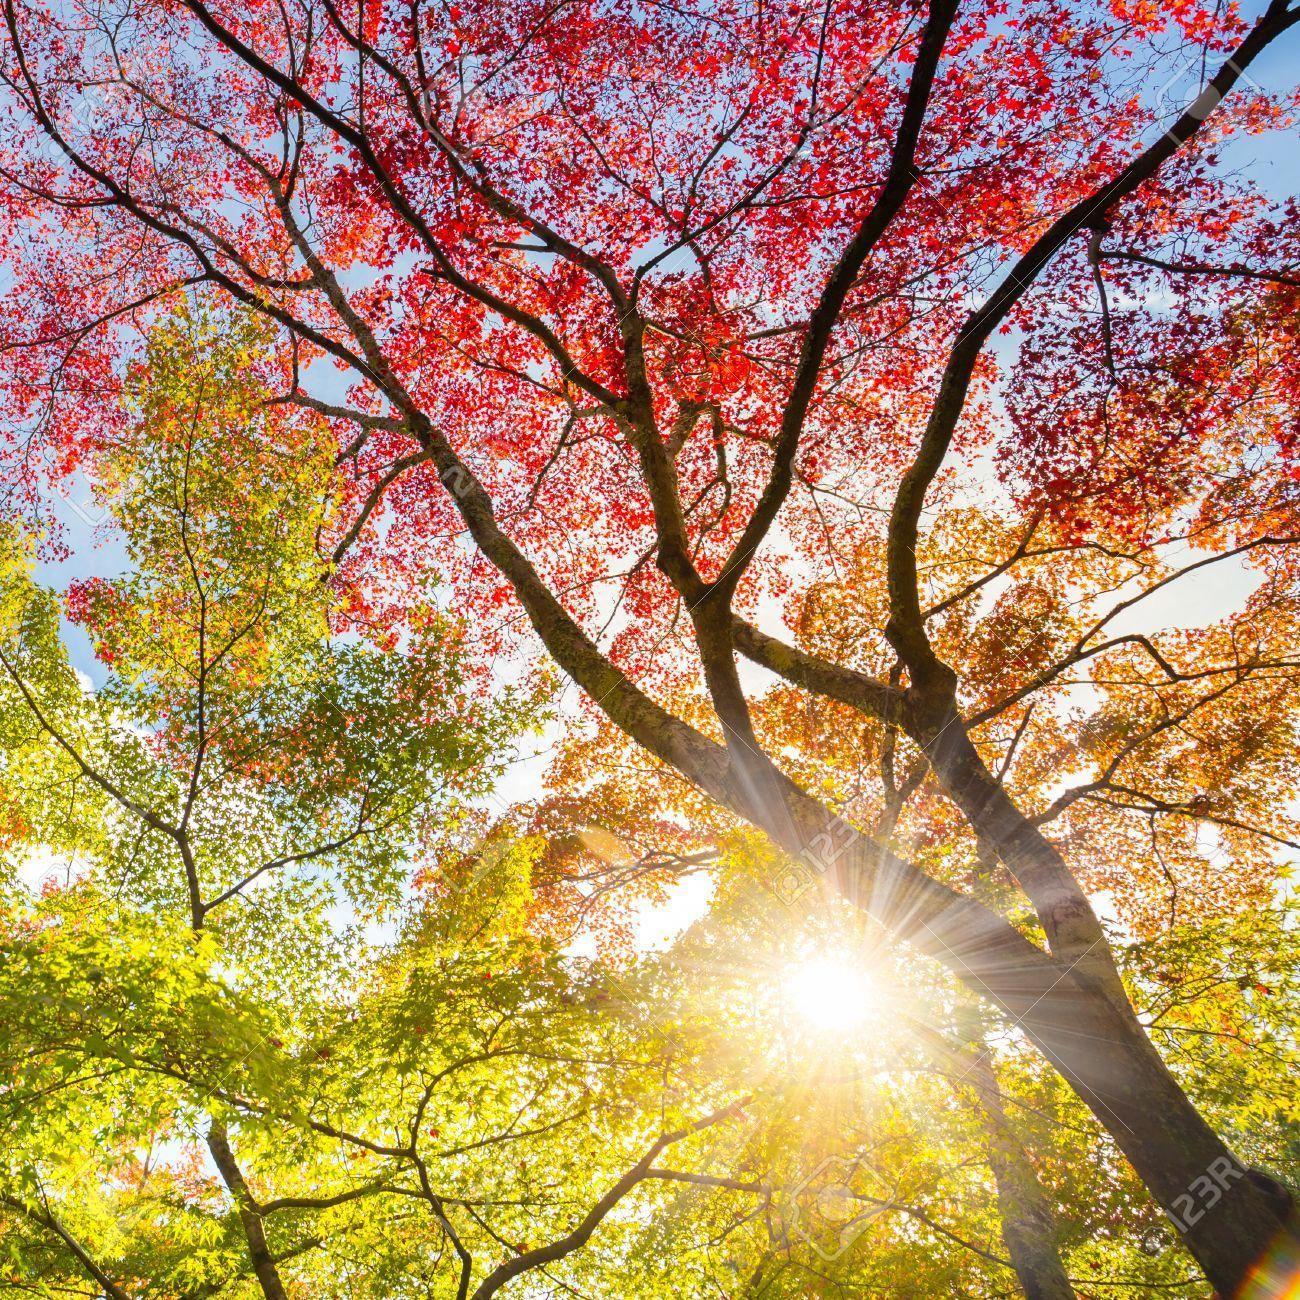 Autumniscoming Solar September Solarpanels Solarenergy